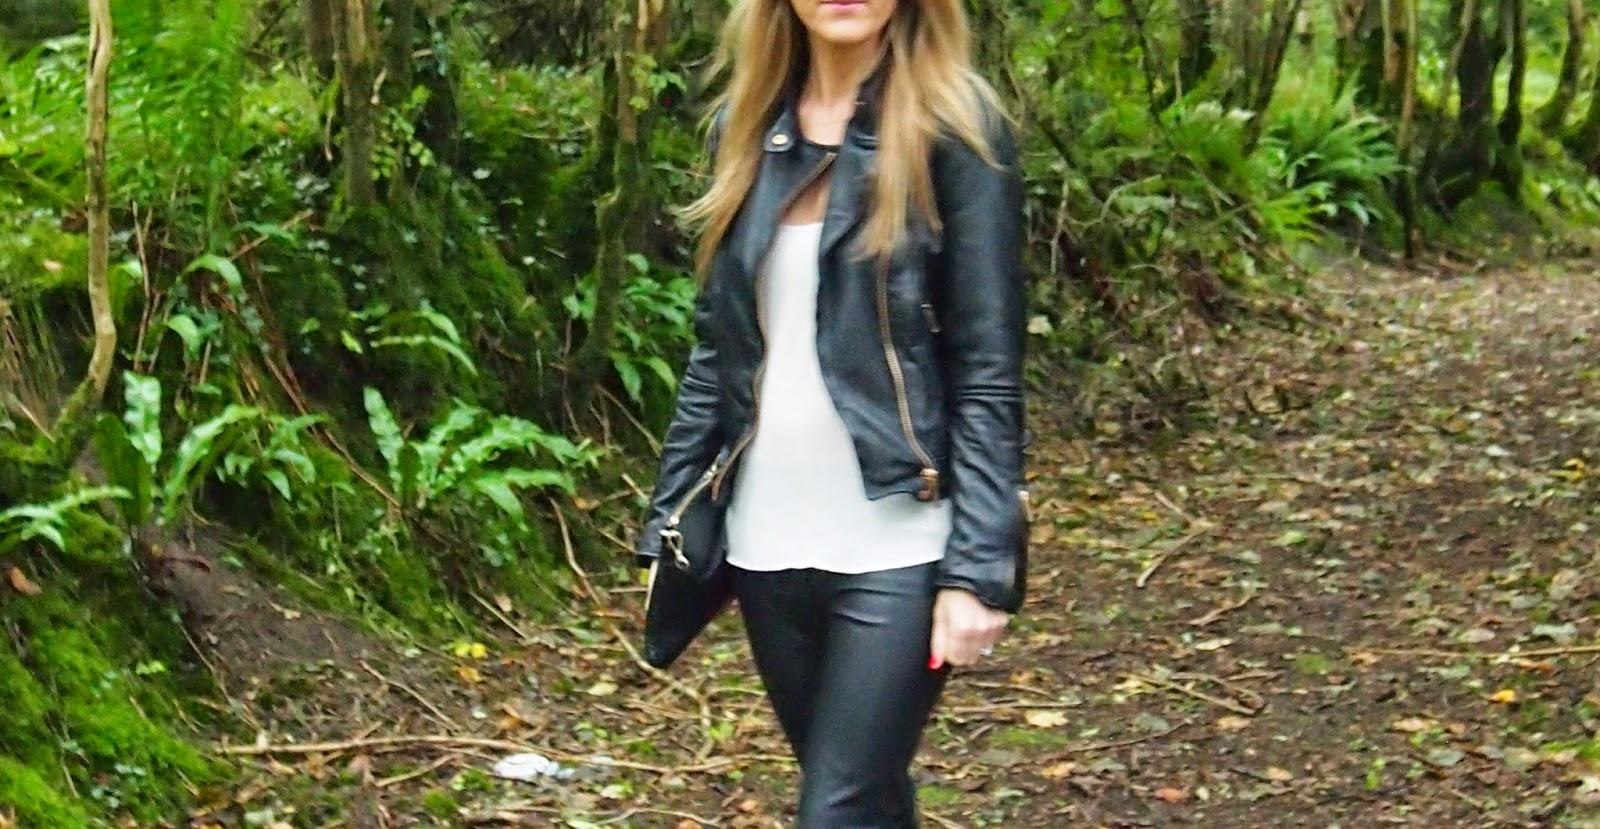 d222c6b9347fd Leather Biker Jacket  Zara A W14 Faux Leather Skinny Pants  Zara Silk Top   Topshop  Leather Clutch  Topshop Shoes   Louboutins